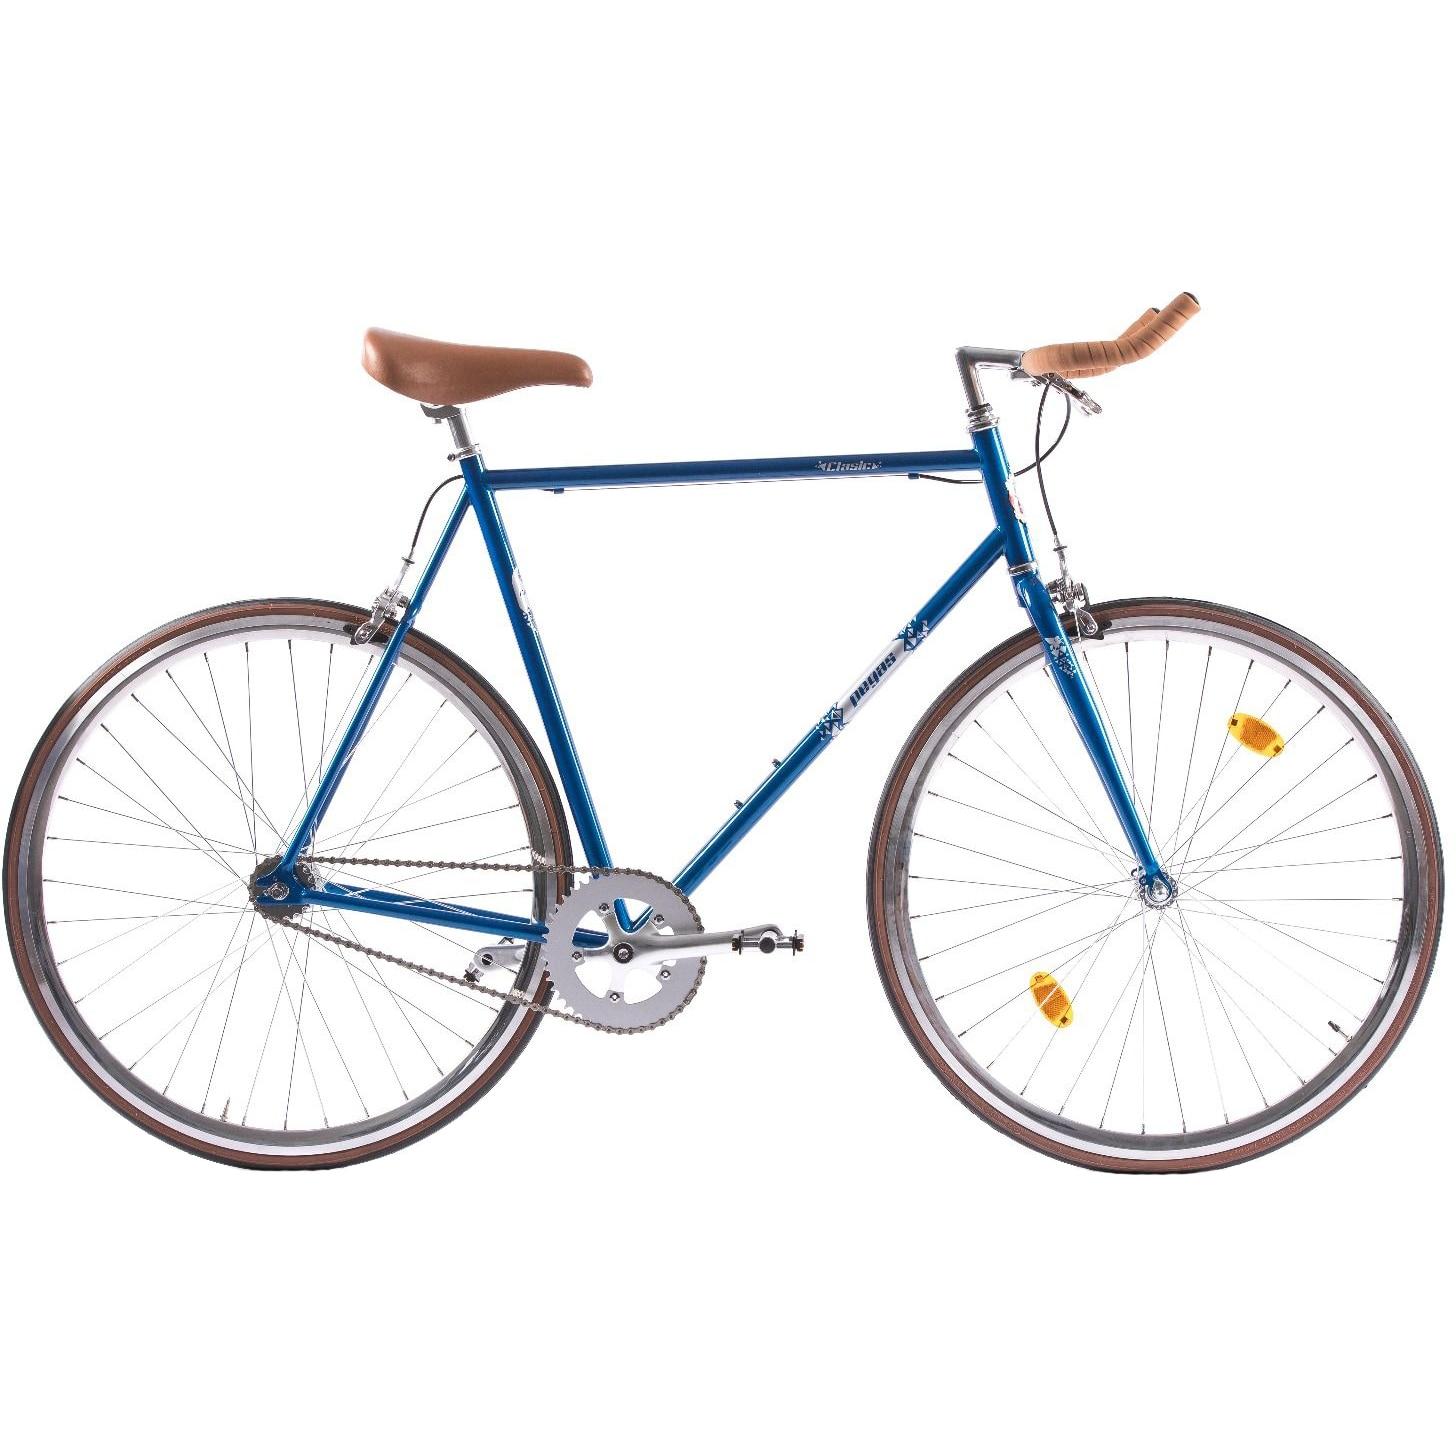 Fotografie Bicicleta Pegas Clasic 2S, Bullhorn Man, 58cm, Bleu